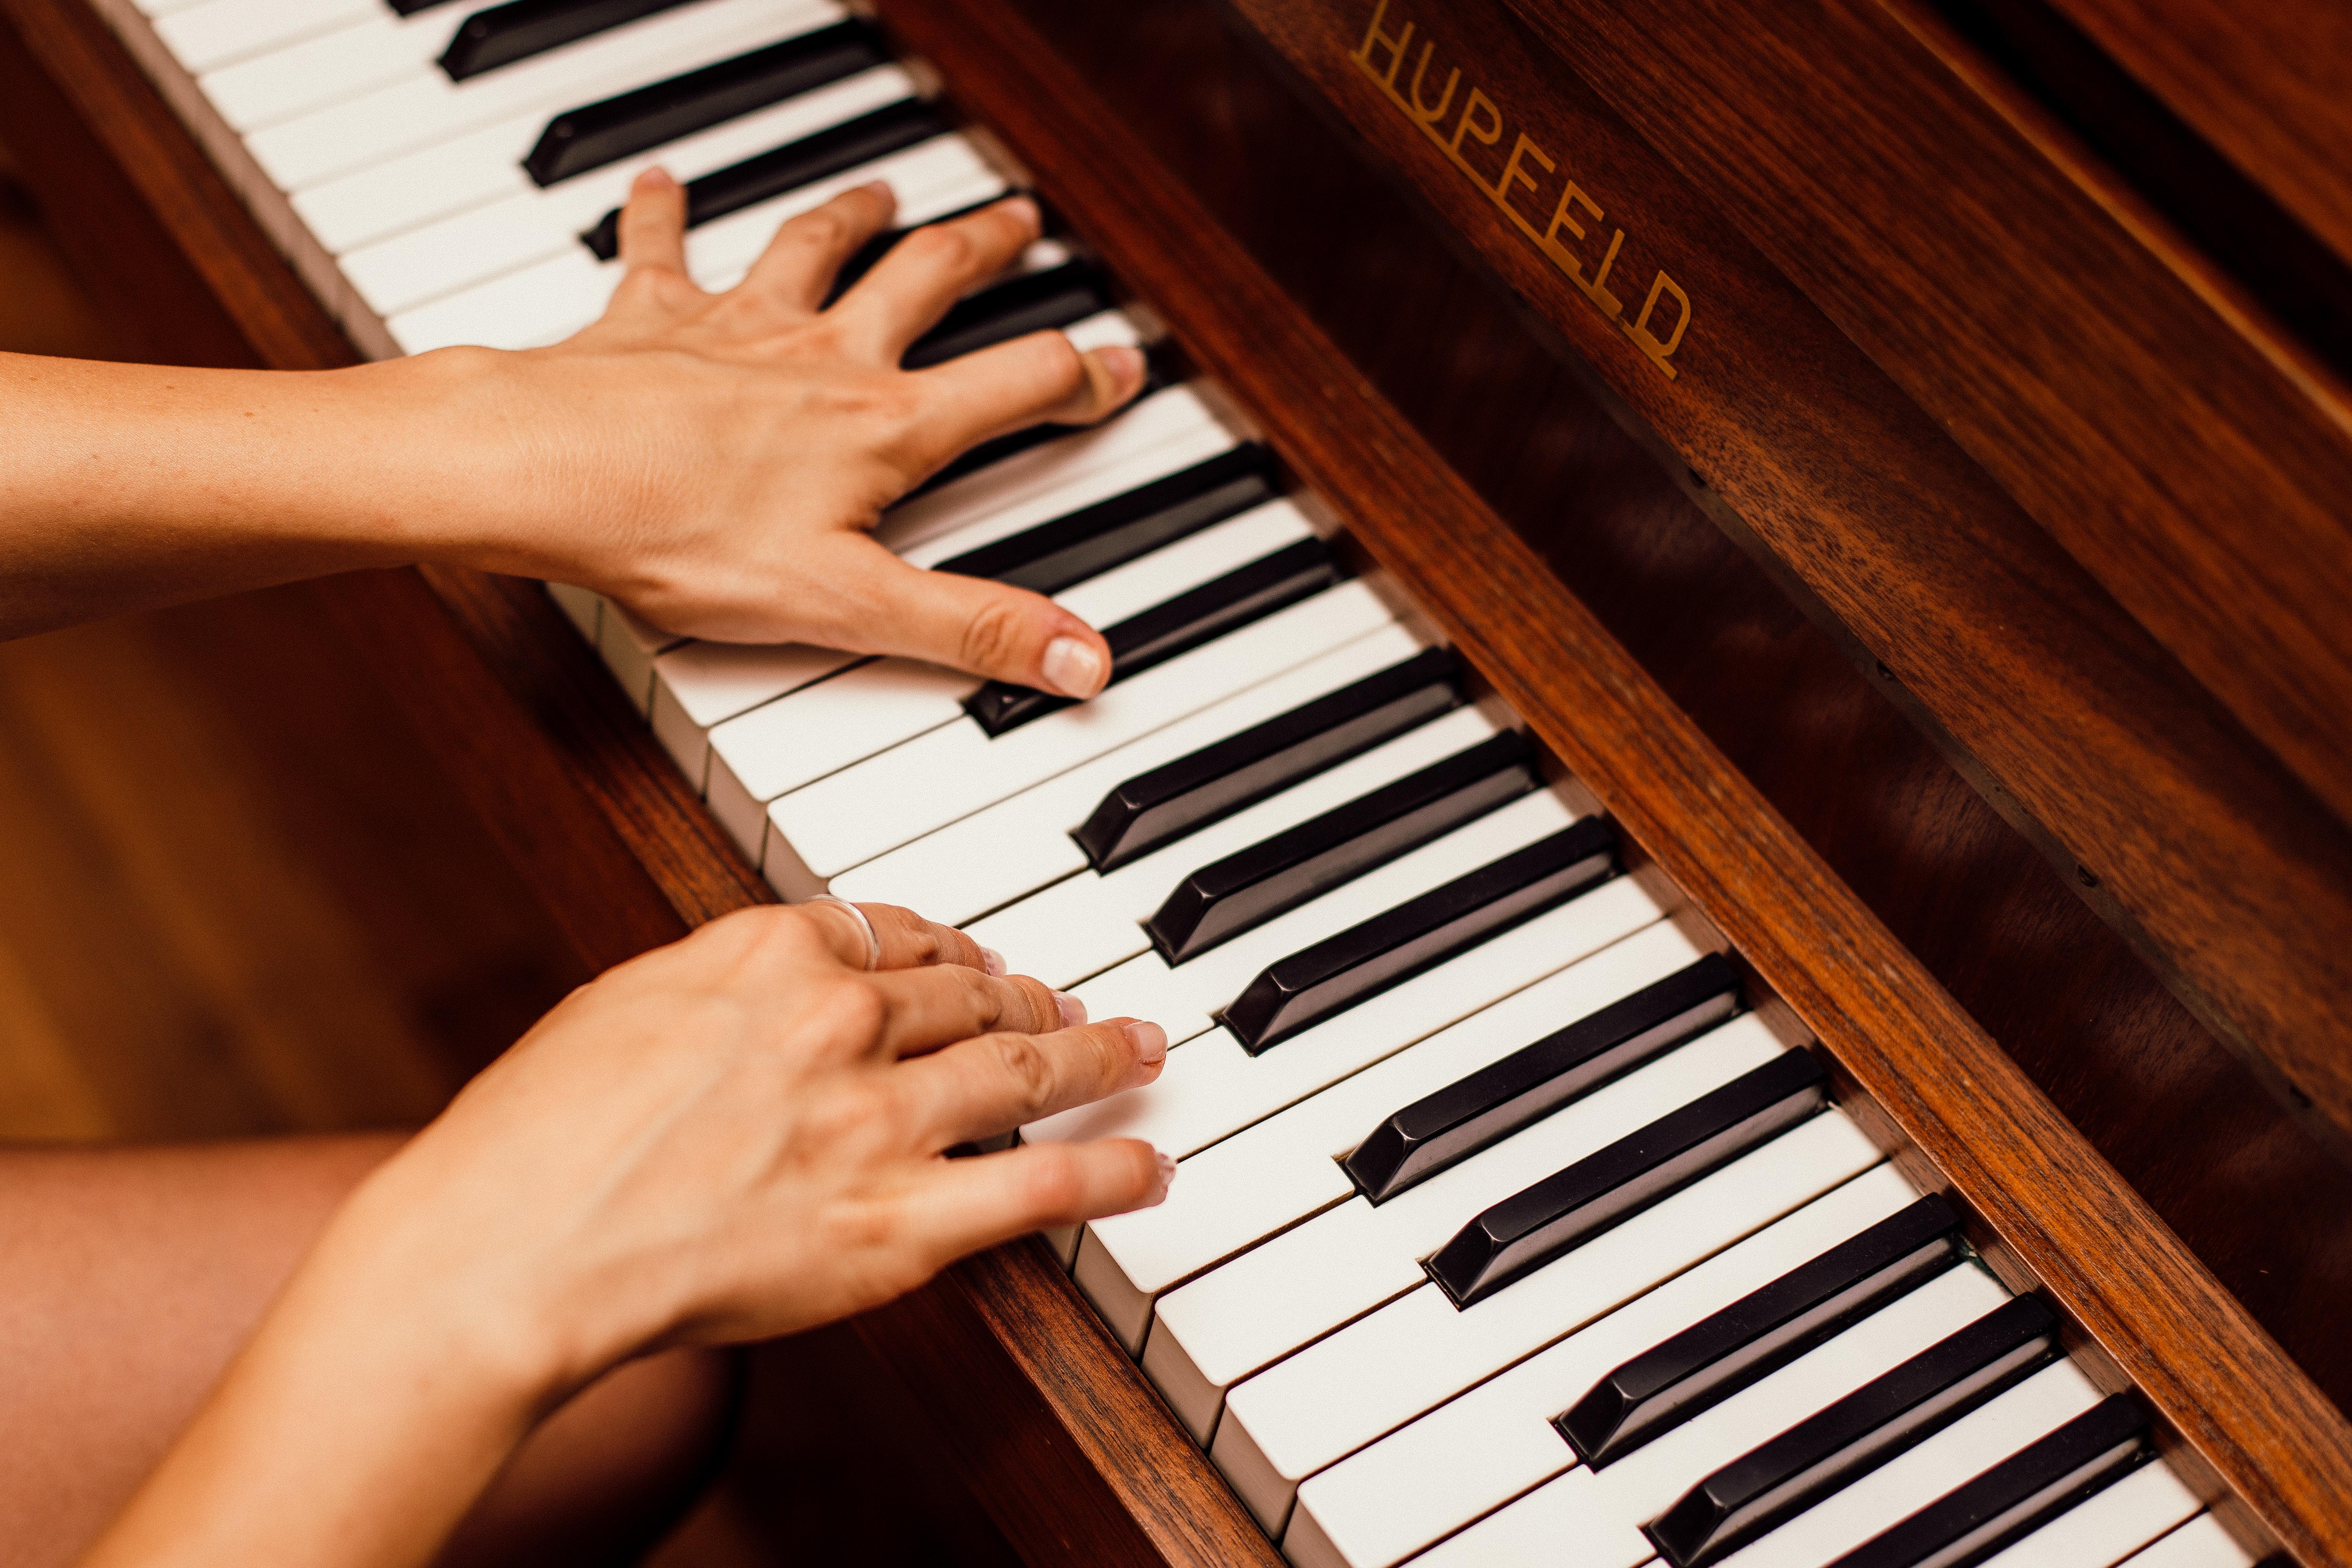 4kの壁紙 ピアニスト ピアノの無料の写真素材